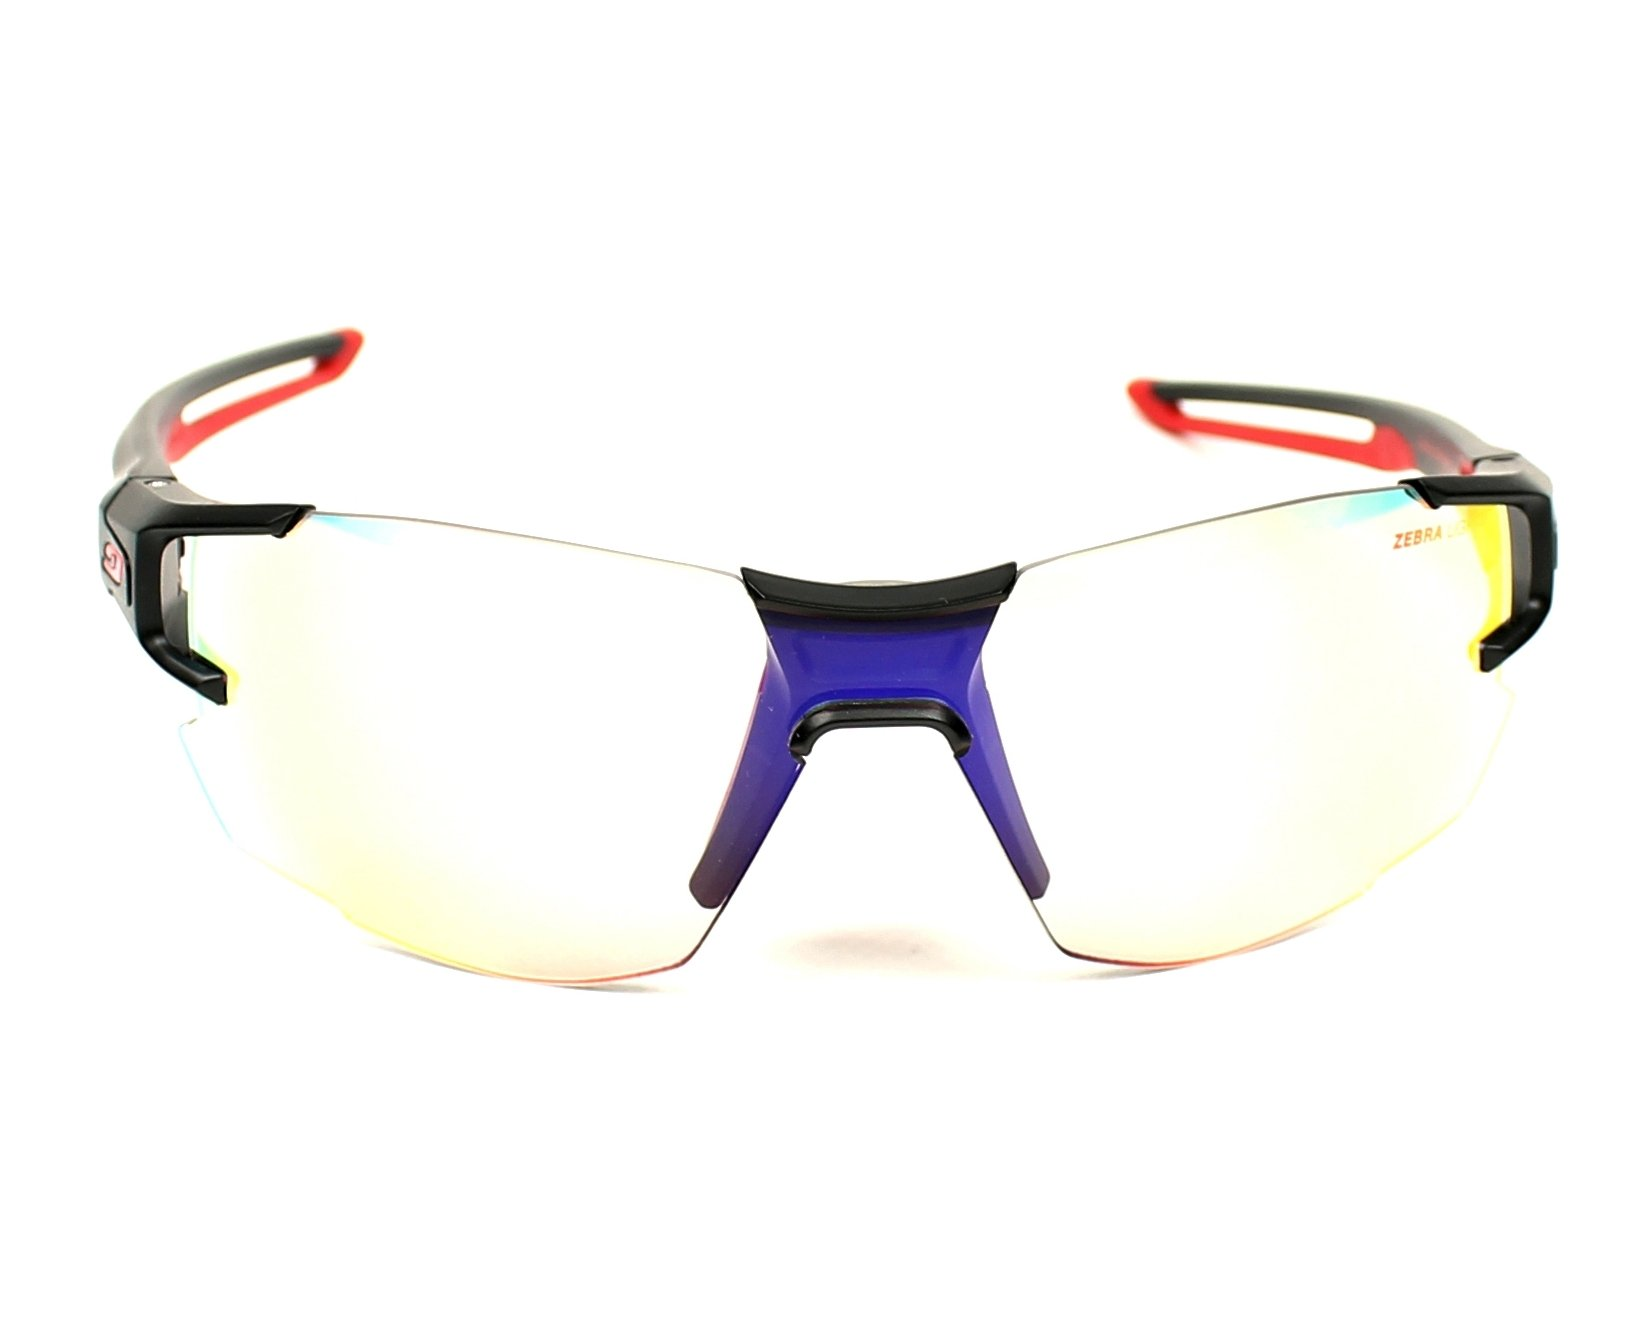 7644e4af06 Julbo Aerolite Sunglasses Utmb